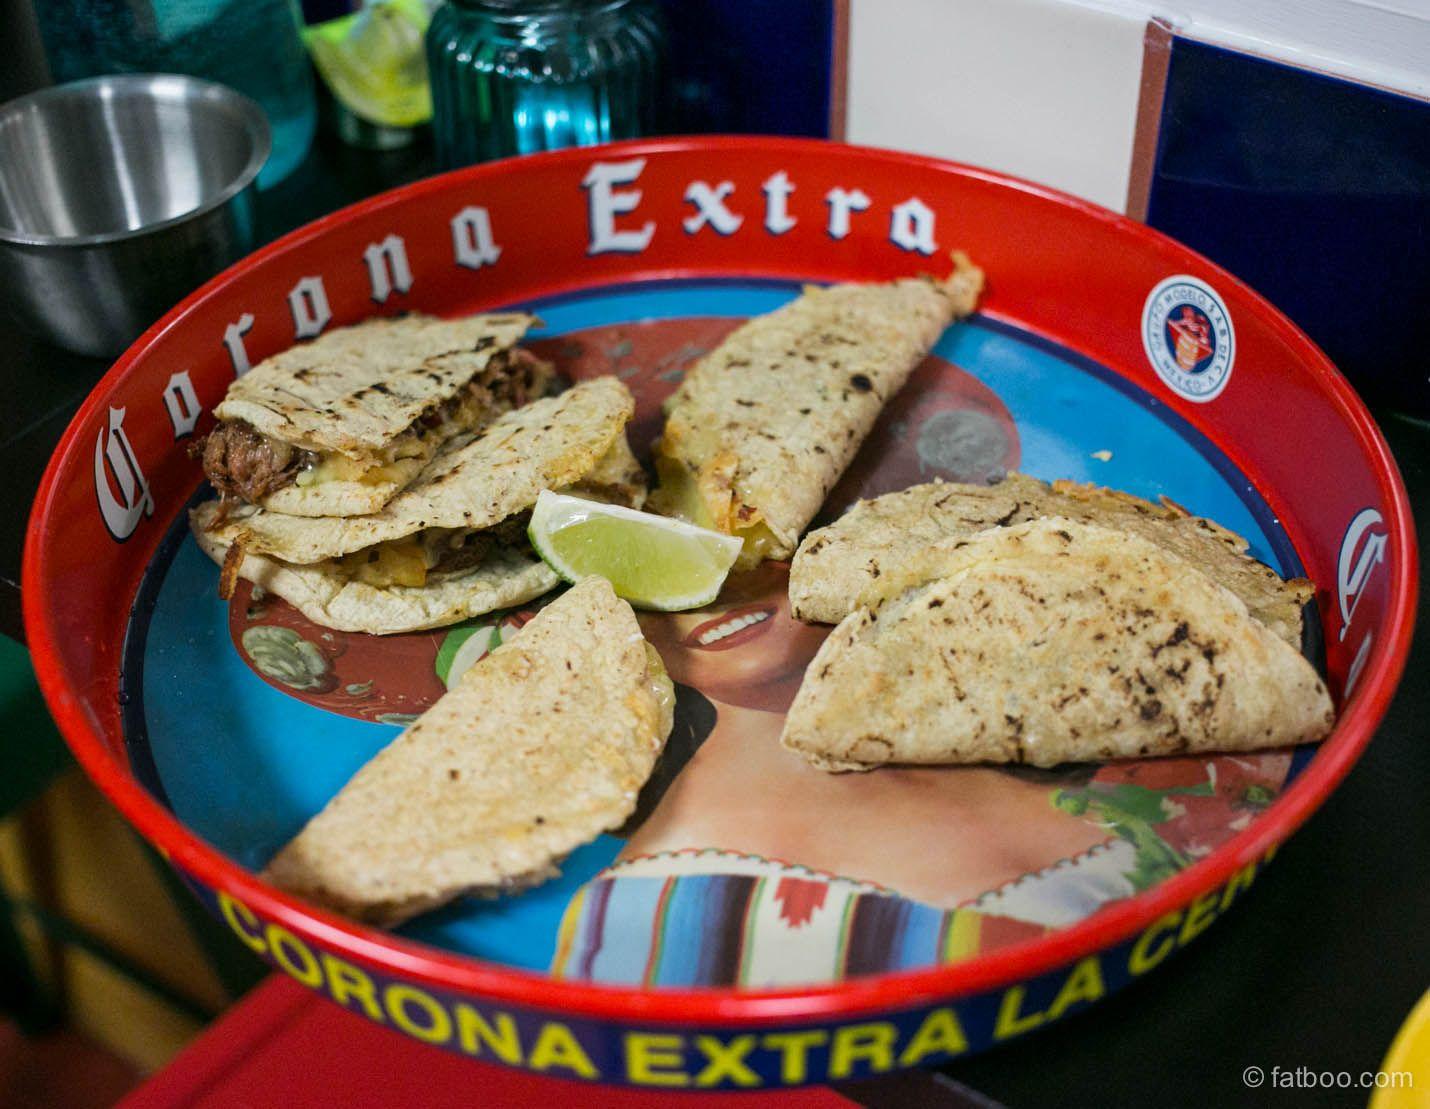 La Tortilleria, a Mexican Taqueria in Kensington  Complete